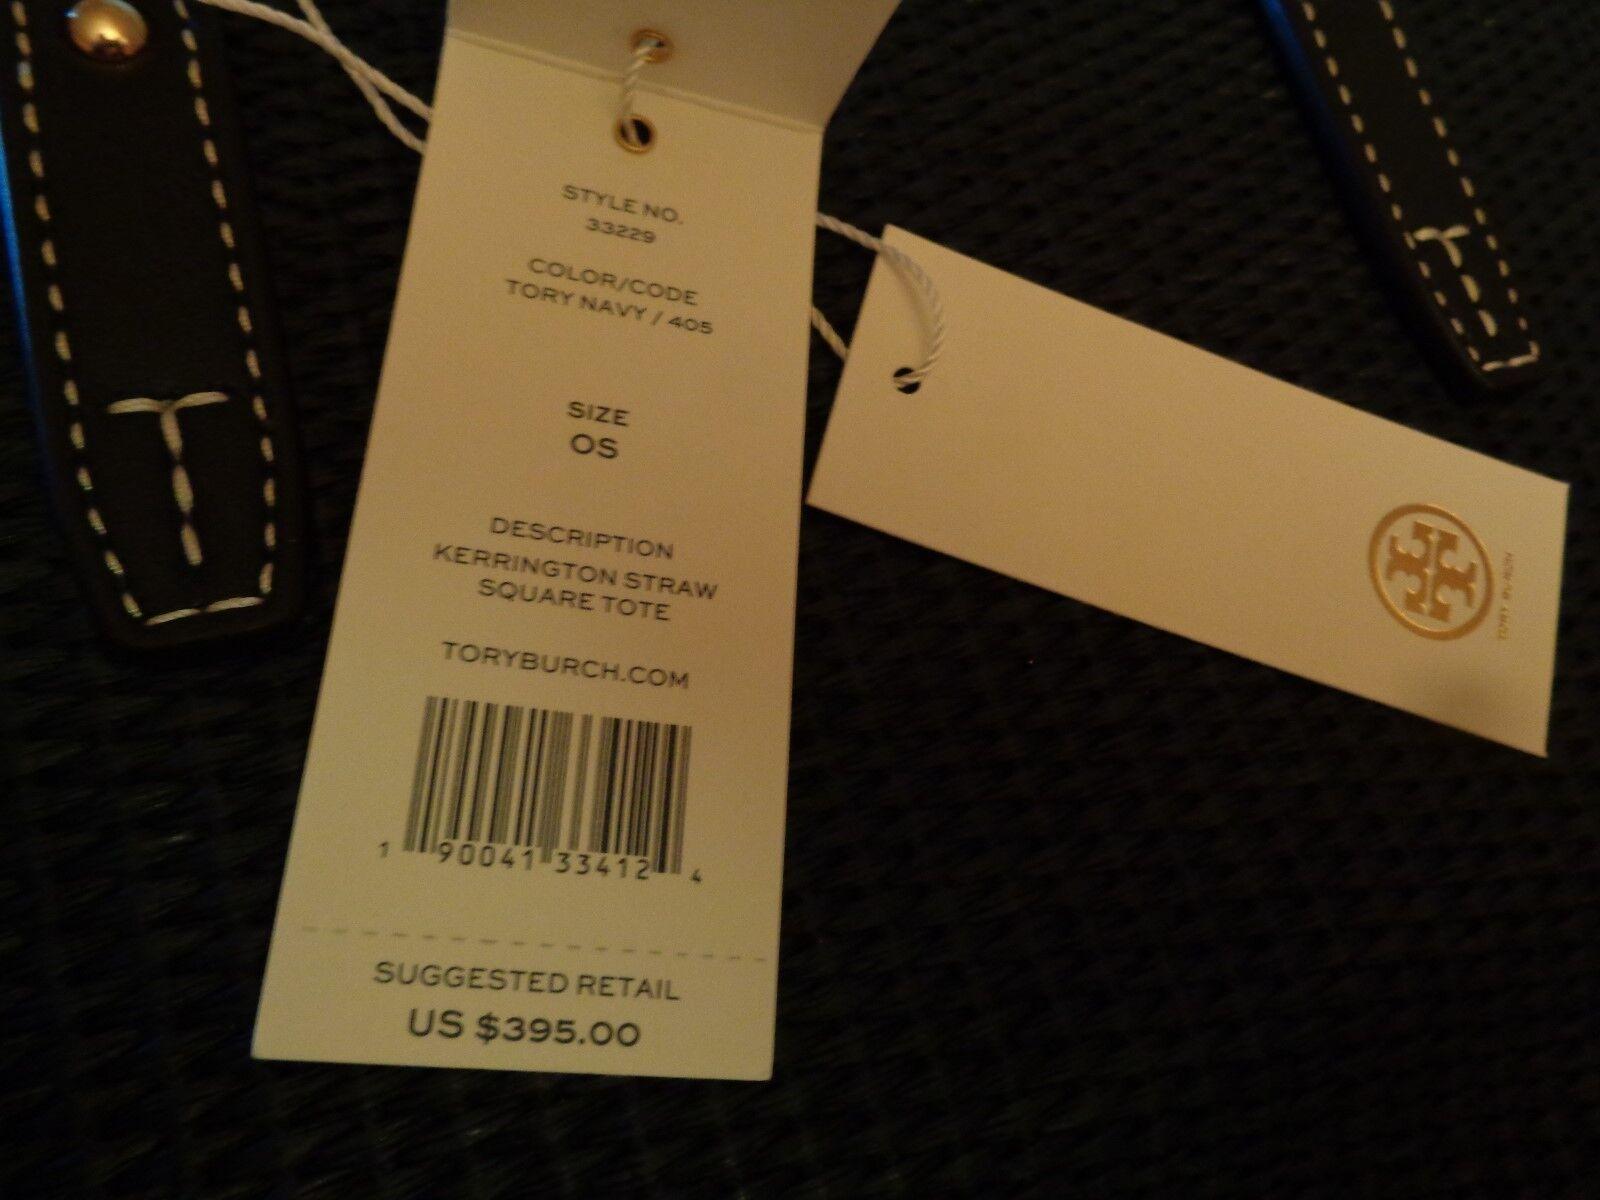 208c26d8d2c1 Auth Tory Burch Kerrington Square Straw Navy Tote Purse Bag for sale online